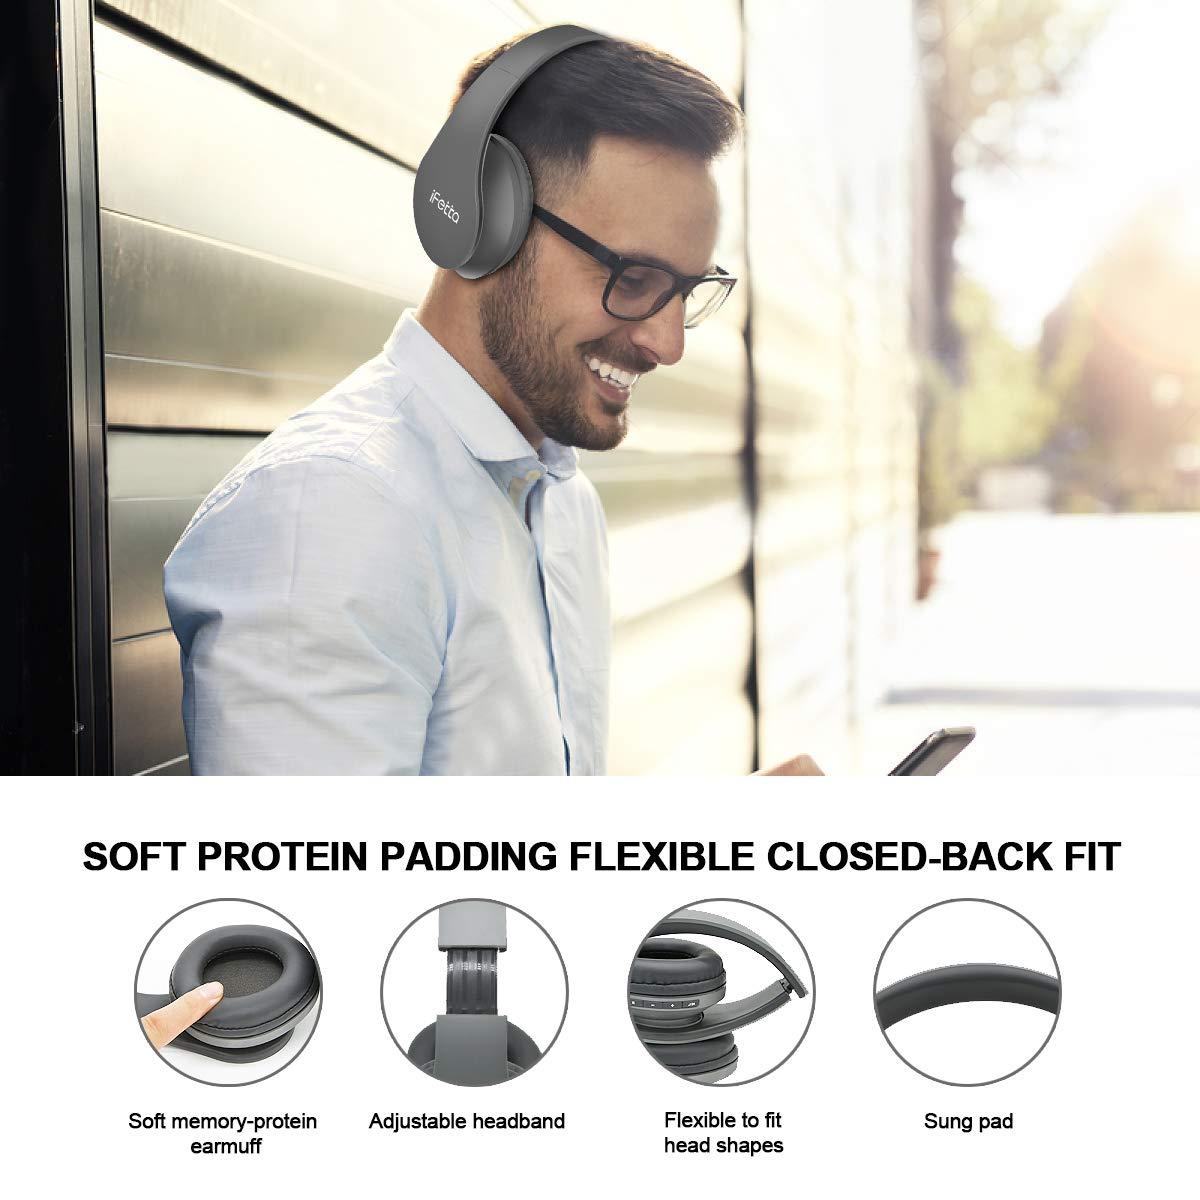 Bluetooth Kopfhörer, Ifecco Bluetooth Headset Wirless Ohrpolster Kopfhörer, Stereo-Headset Sport Hörer Kompatibel mit Allen Gängigen Smartphones/Tablets/Notebooks (Upgrade grau)